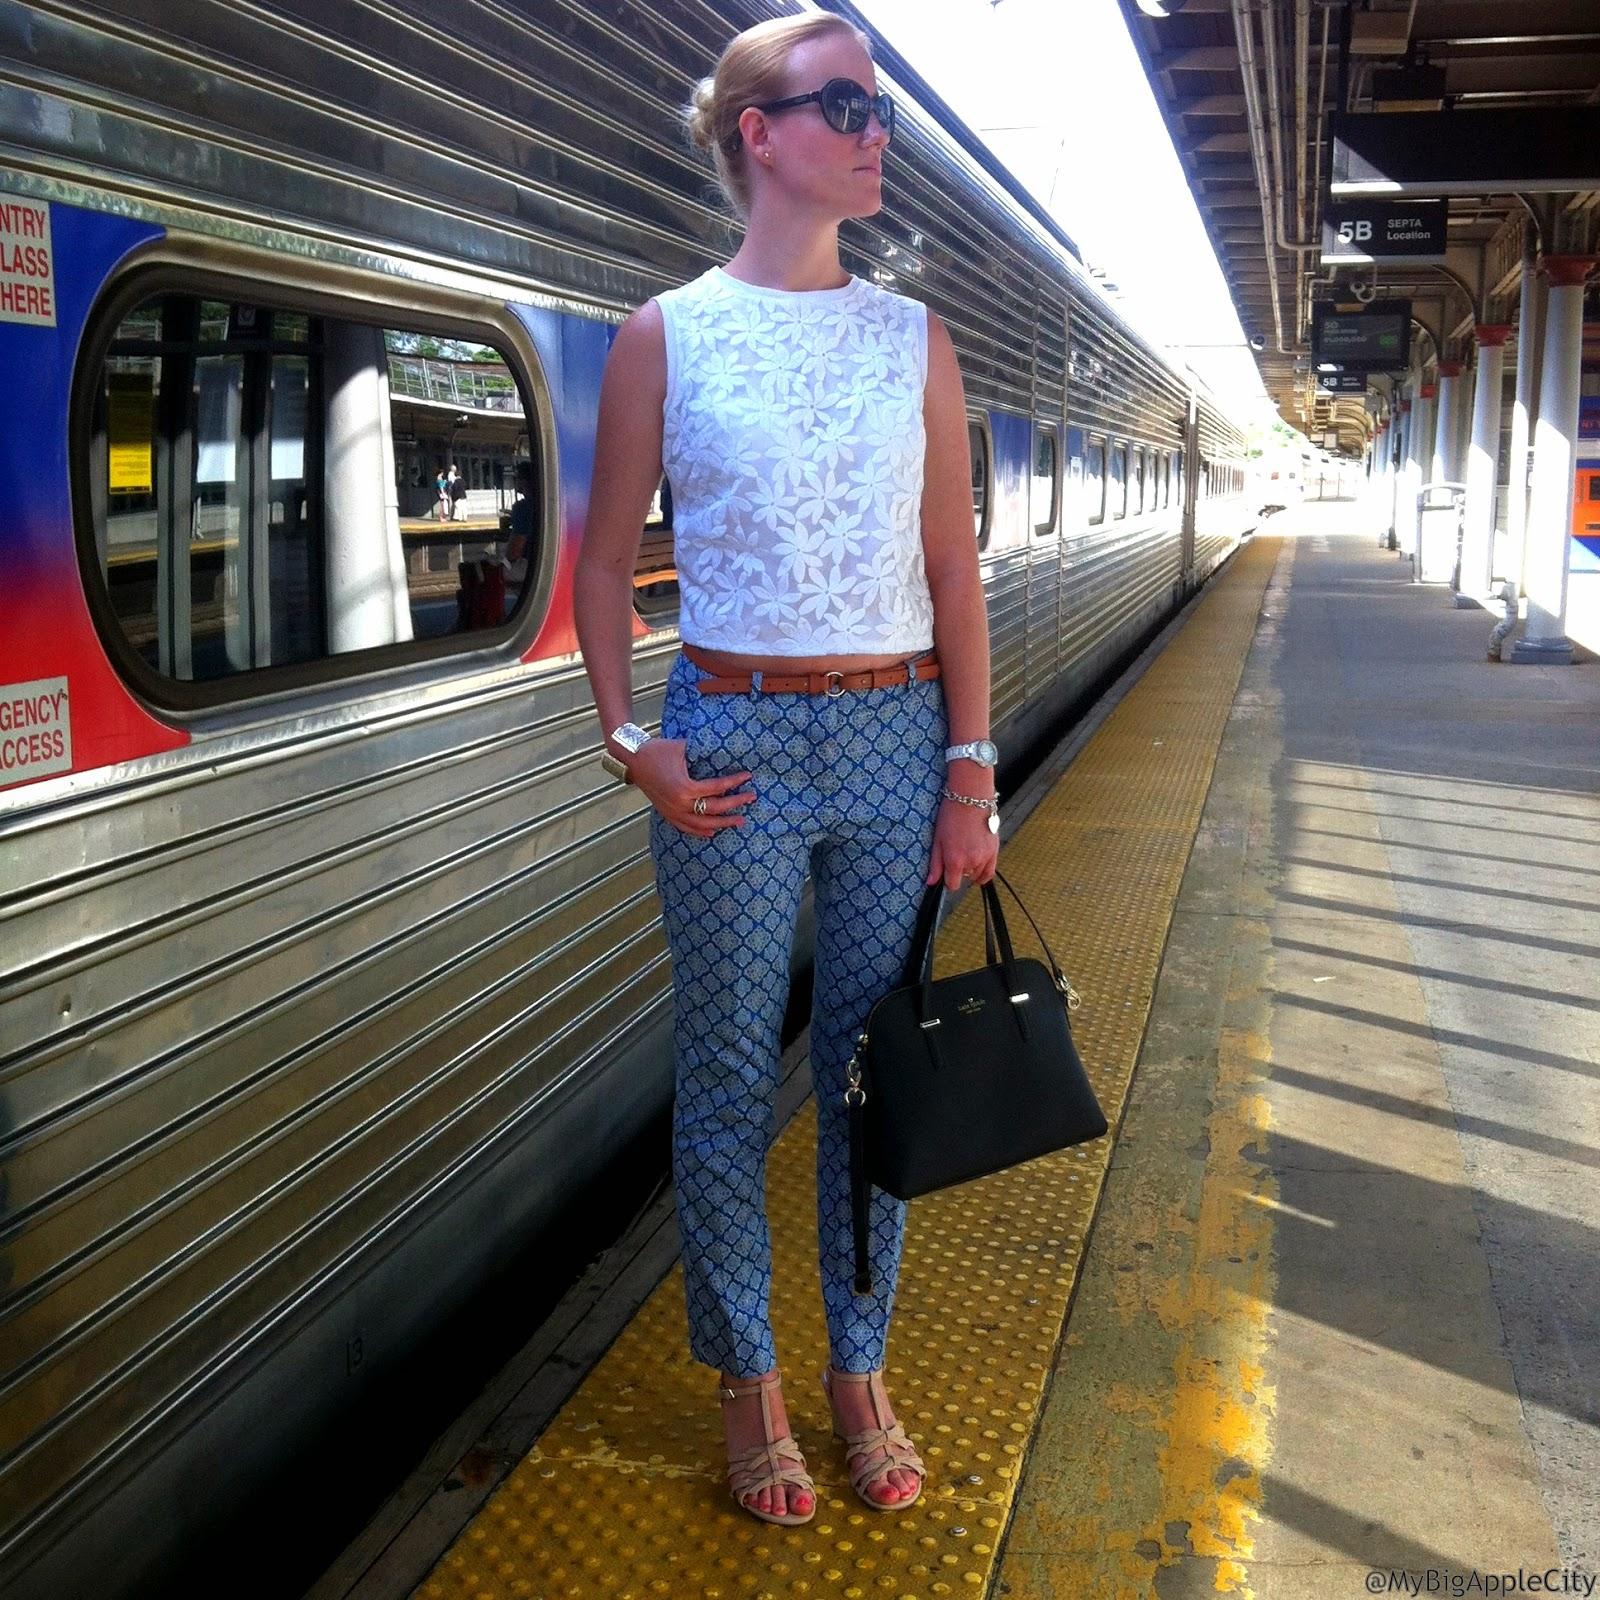 fashion-blog-new-york-style-ootd-travel